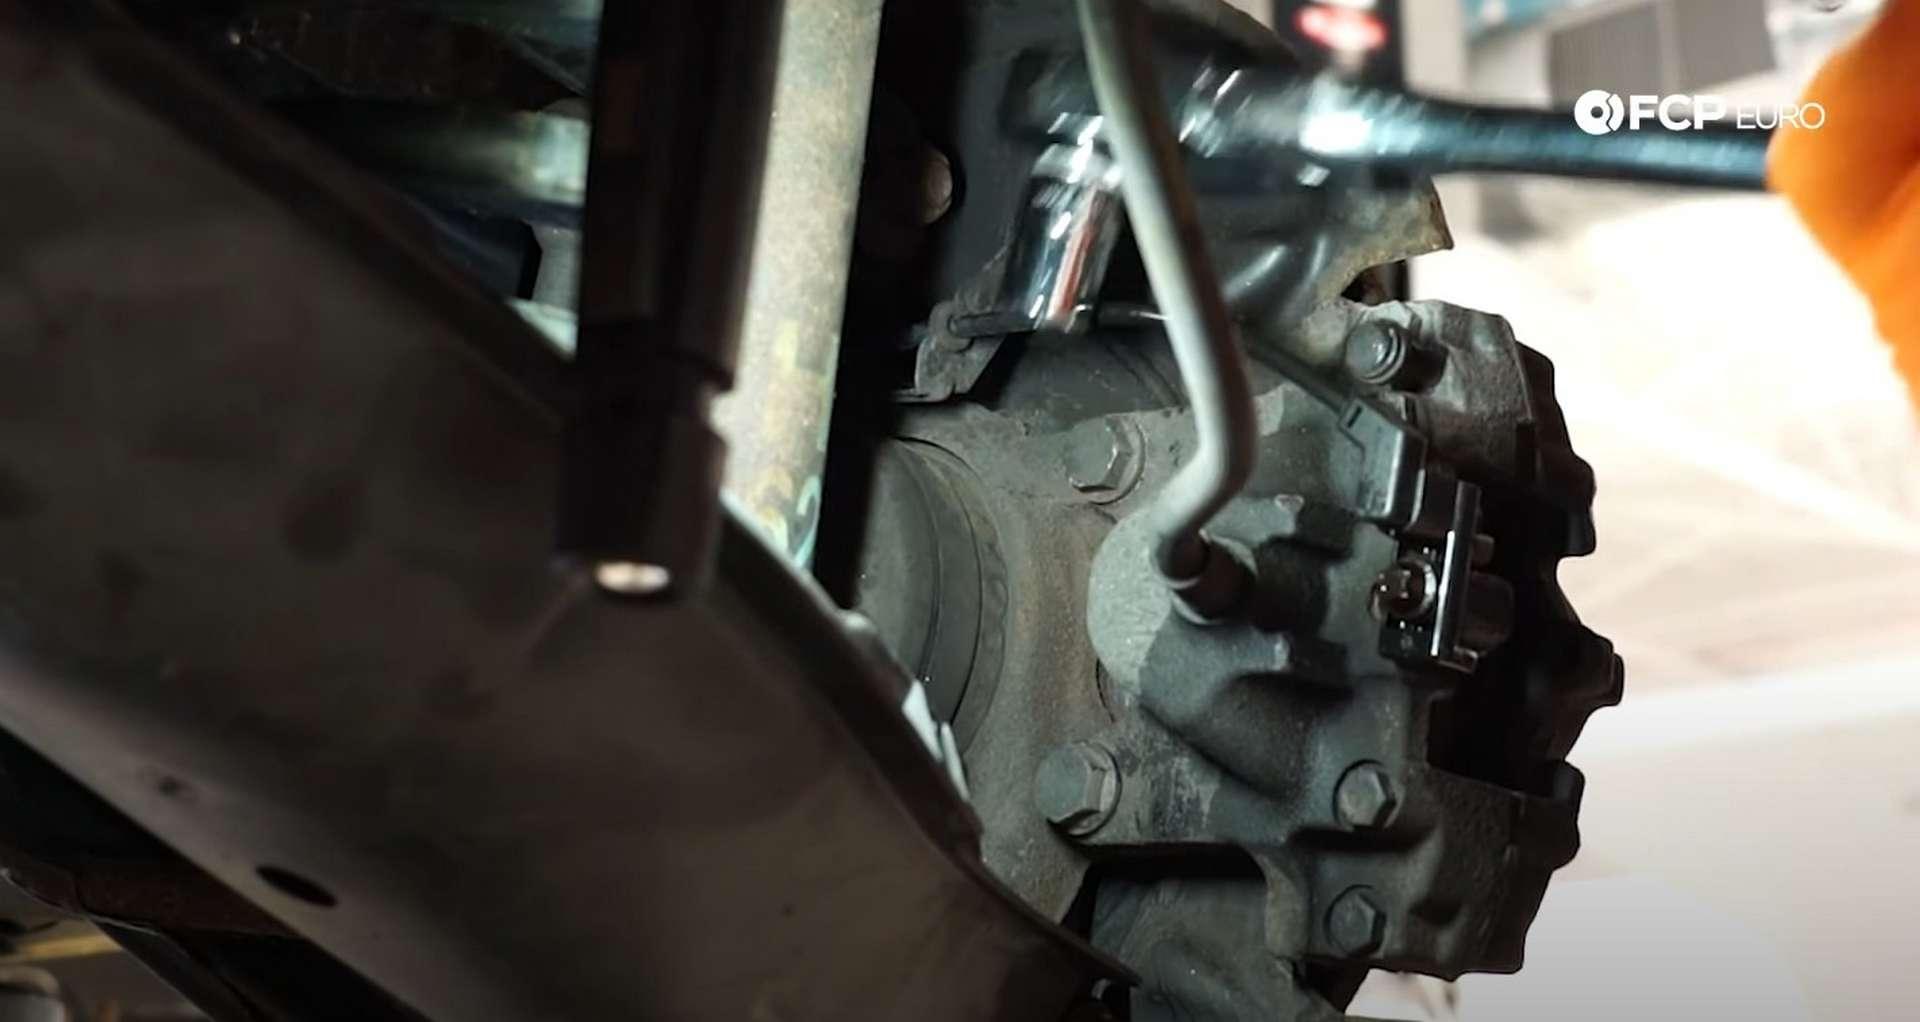 05-DIY-Mercedes-W203-Rear-Brake-Service_Removing-Caliper